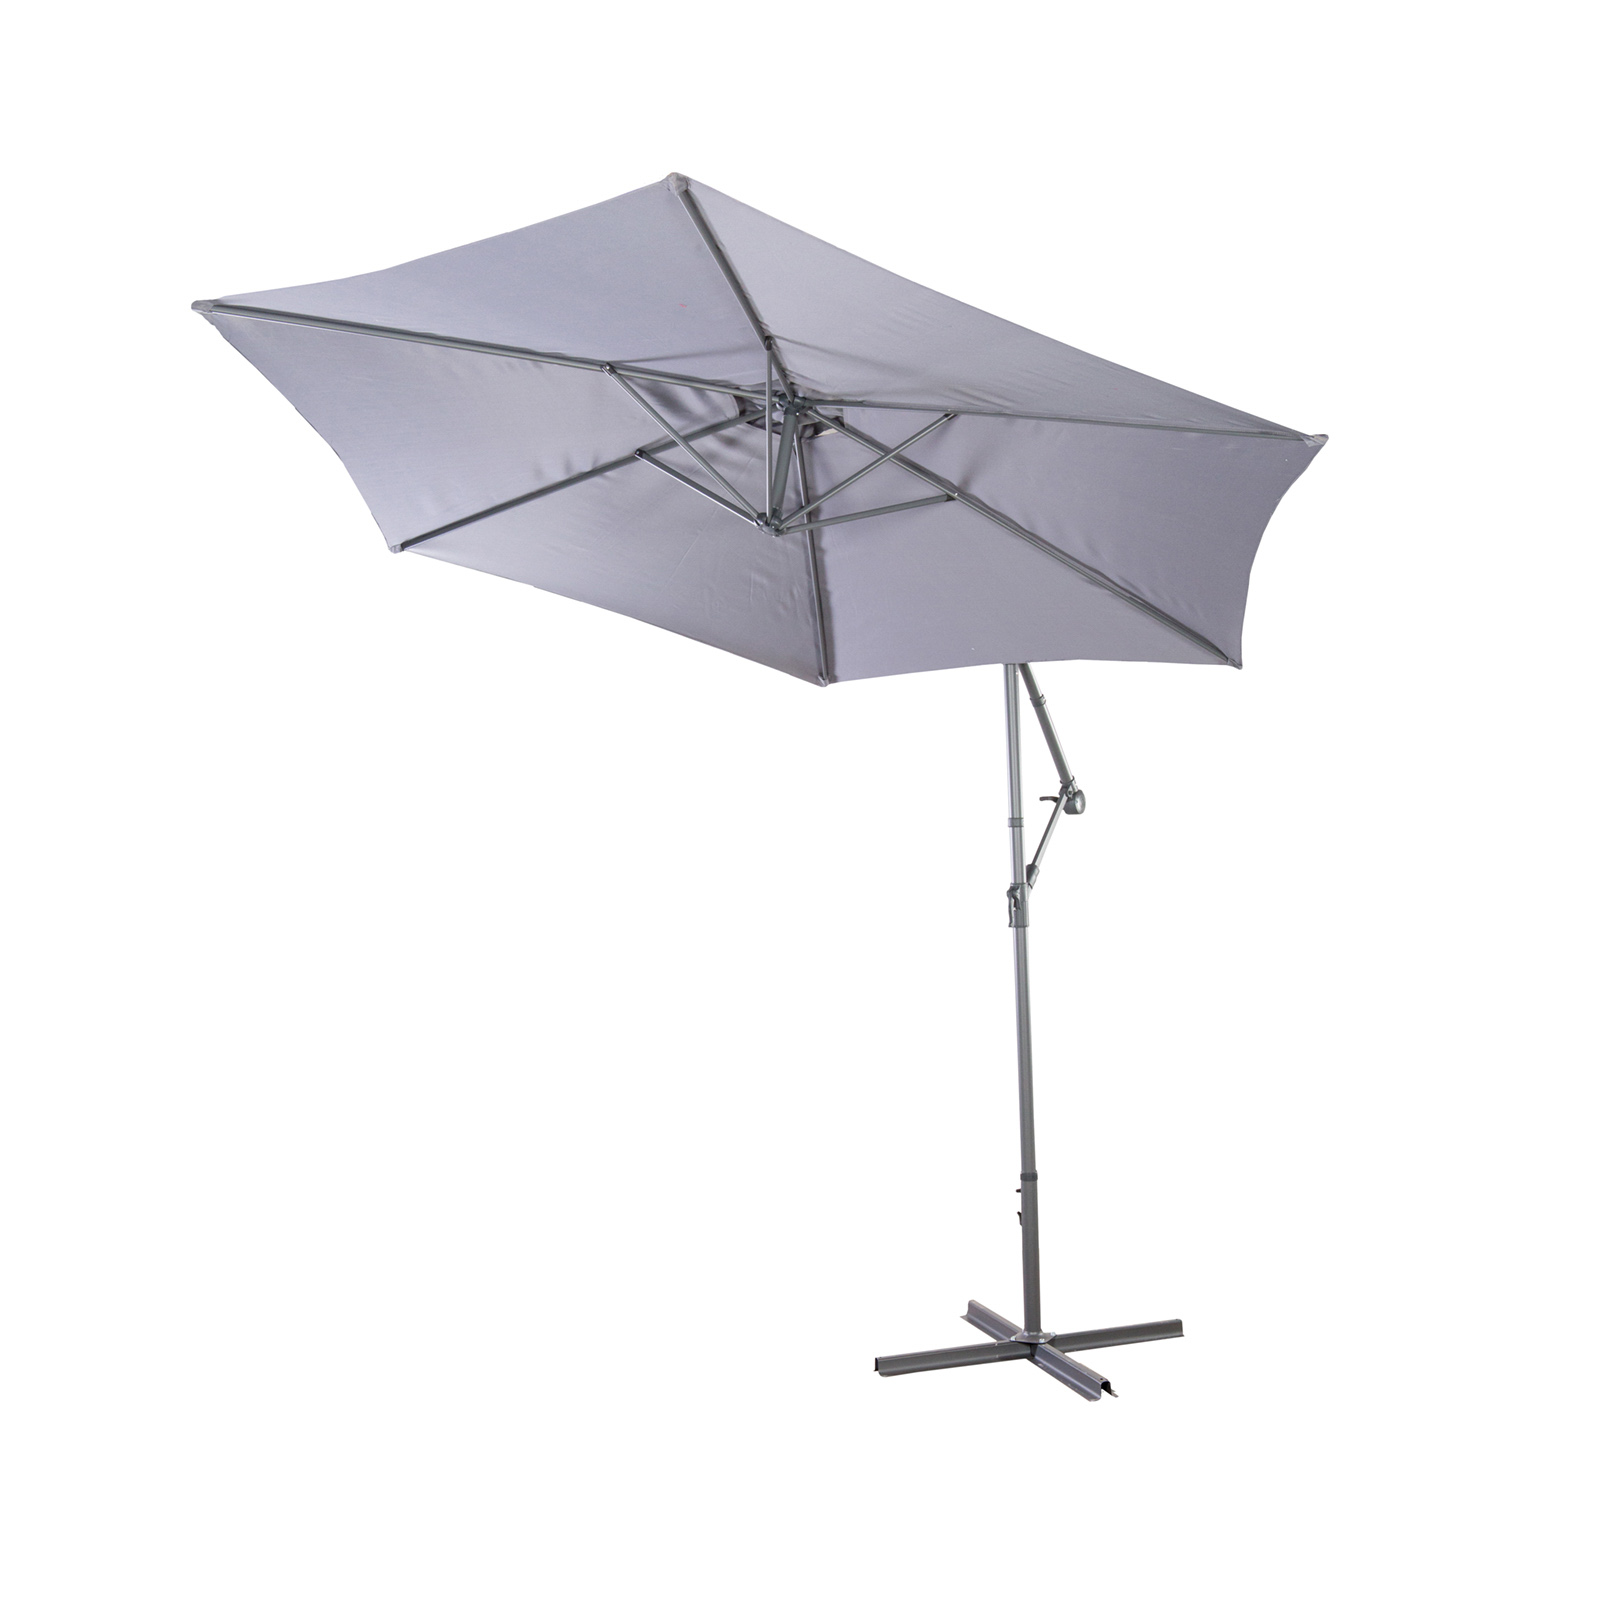 ampelschirm sonnenschirm 3m sonnenschutz schwenkbar aluminium gestell grau ant ebay. Black Bedroom Furniture Sets. Home Design Ideas